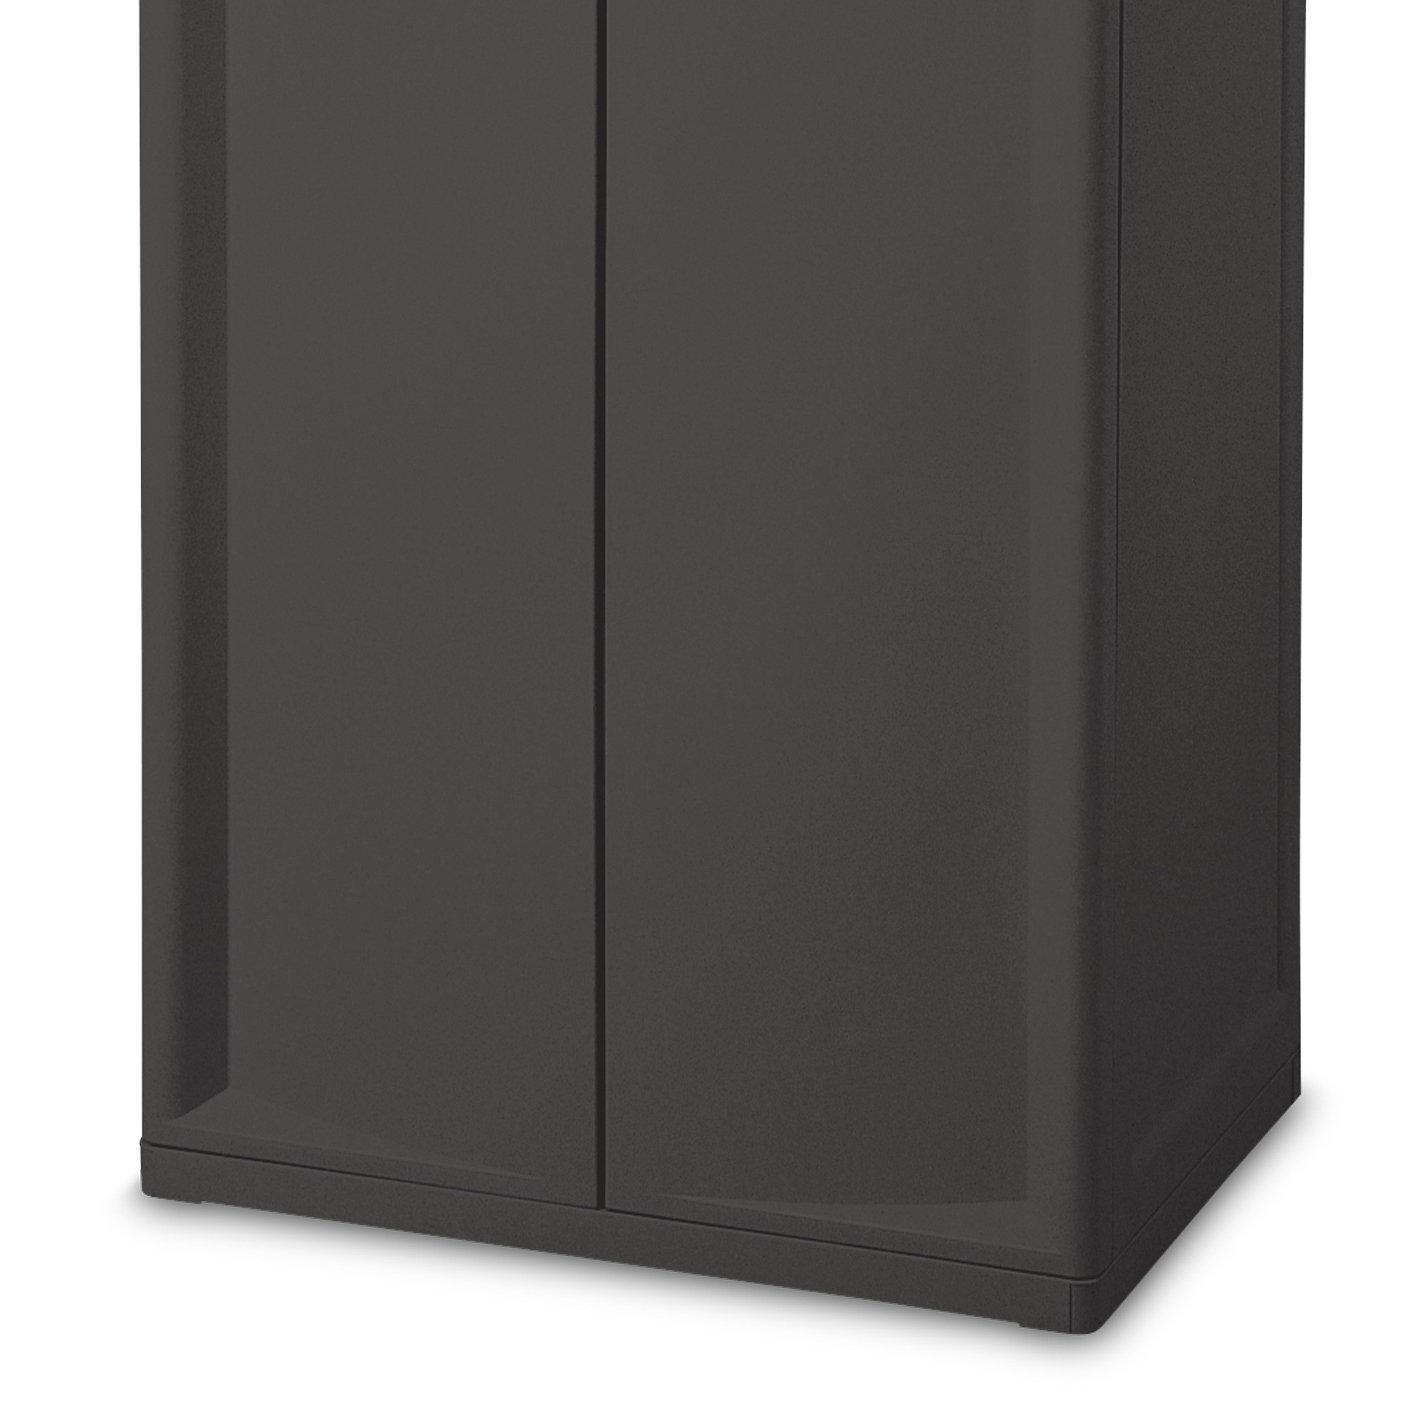 Large Utility Cabinet Storage Bin Pantry Tool Garage Hobby Food 4 Shelves Doors Other